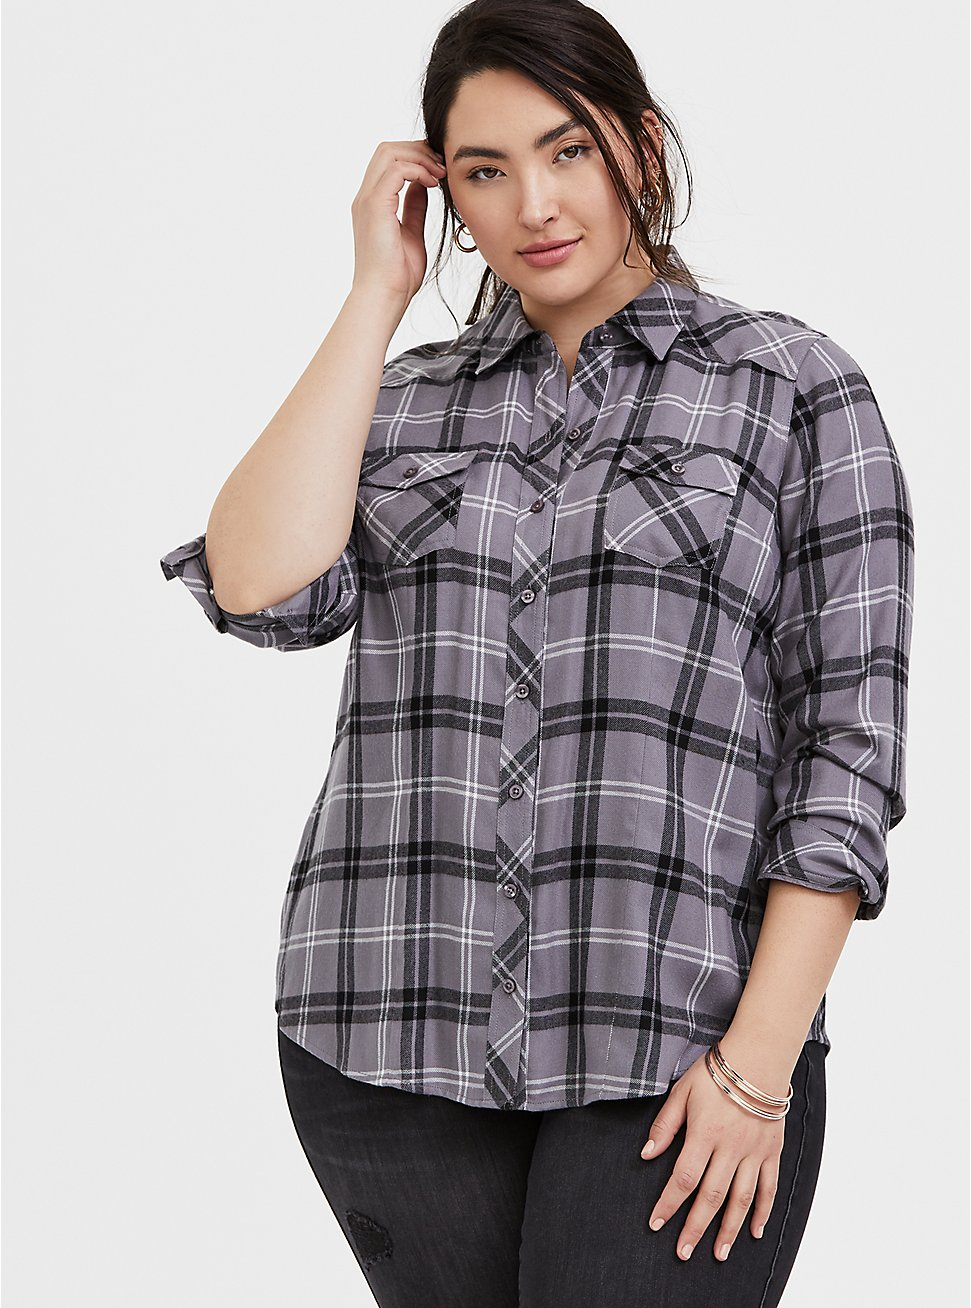 Taylor - Grey Plaid Twill Button Front Slim Fit Shirt, PLAID - GREY, hi-res